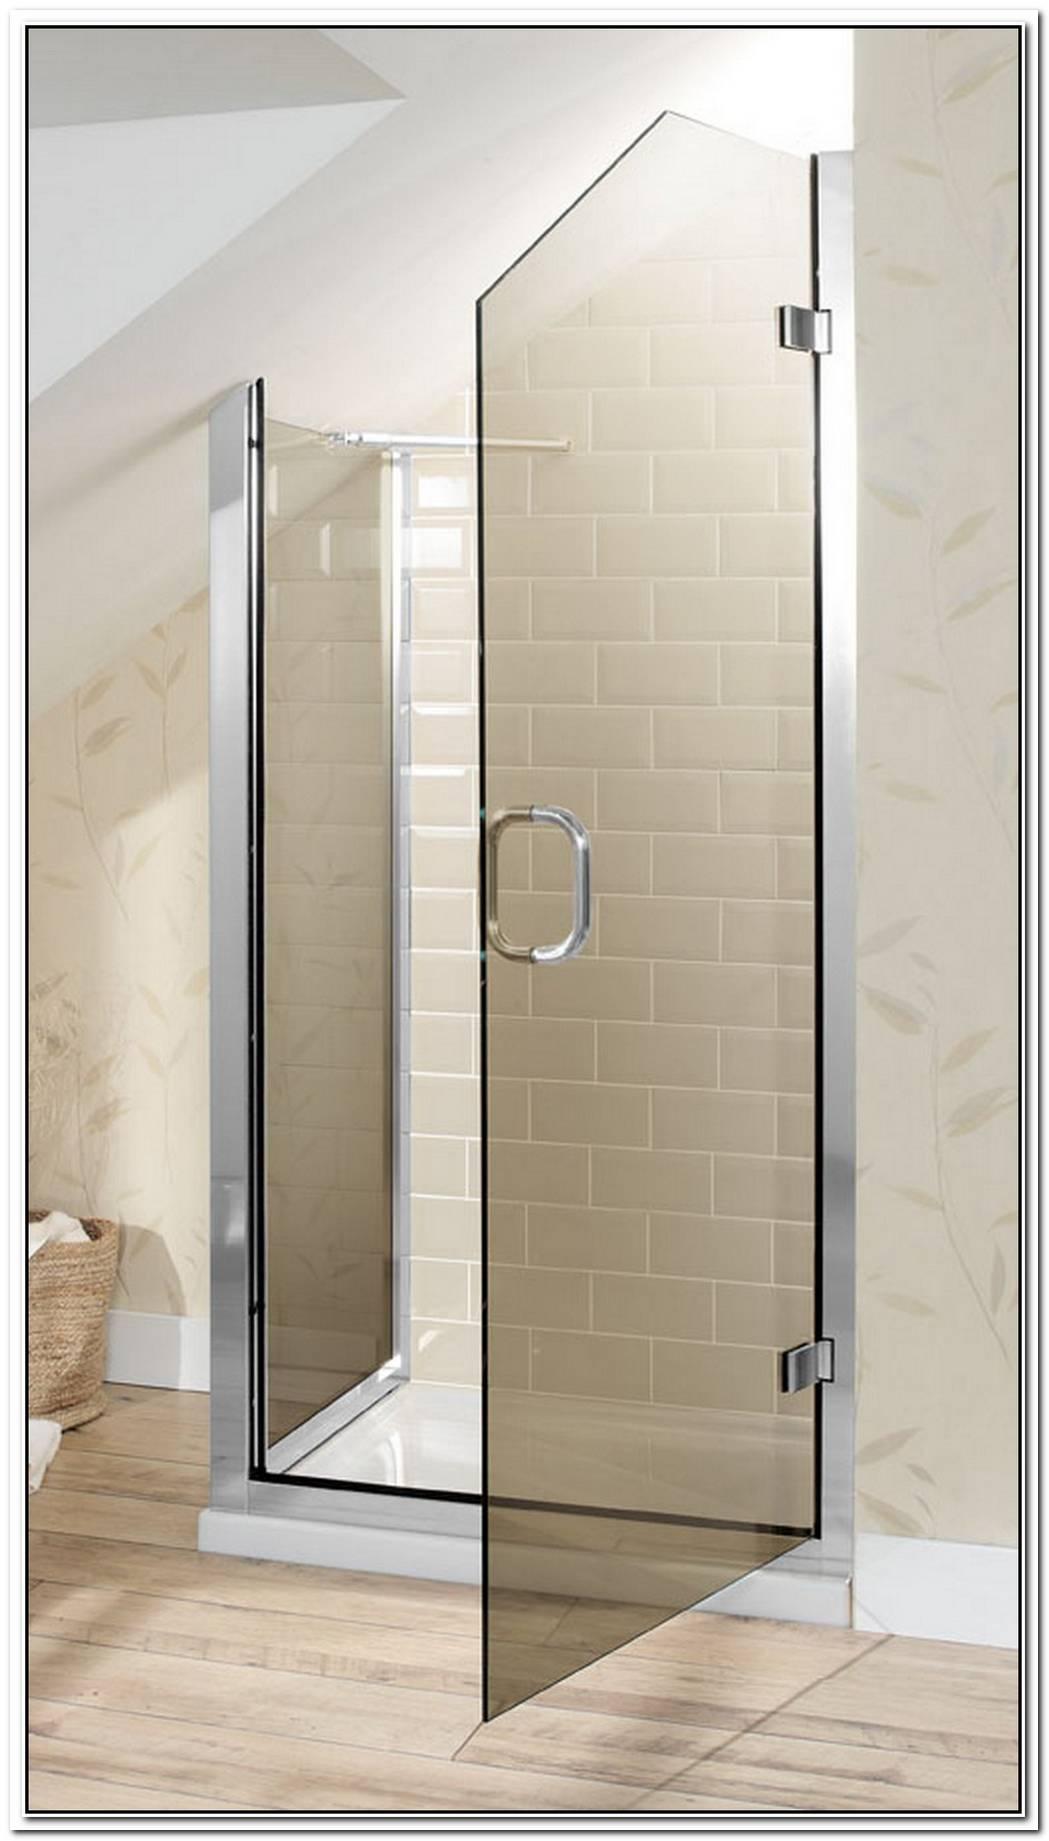 Loft Bathroom Shower Enclosure